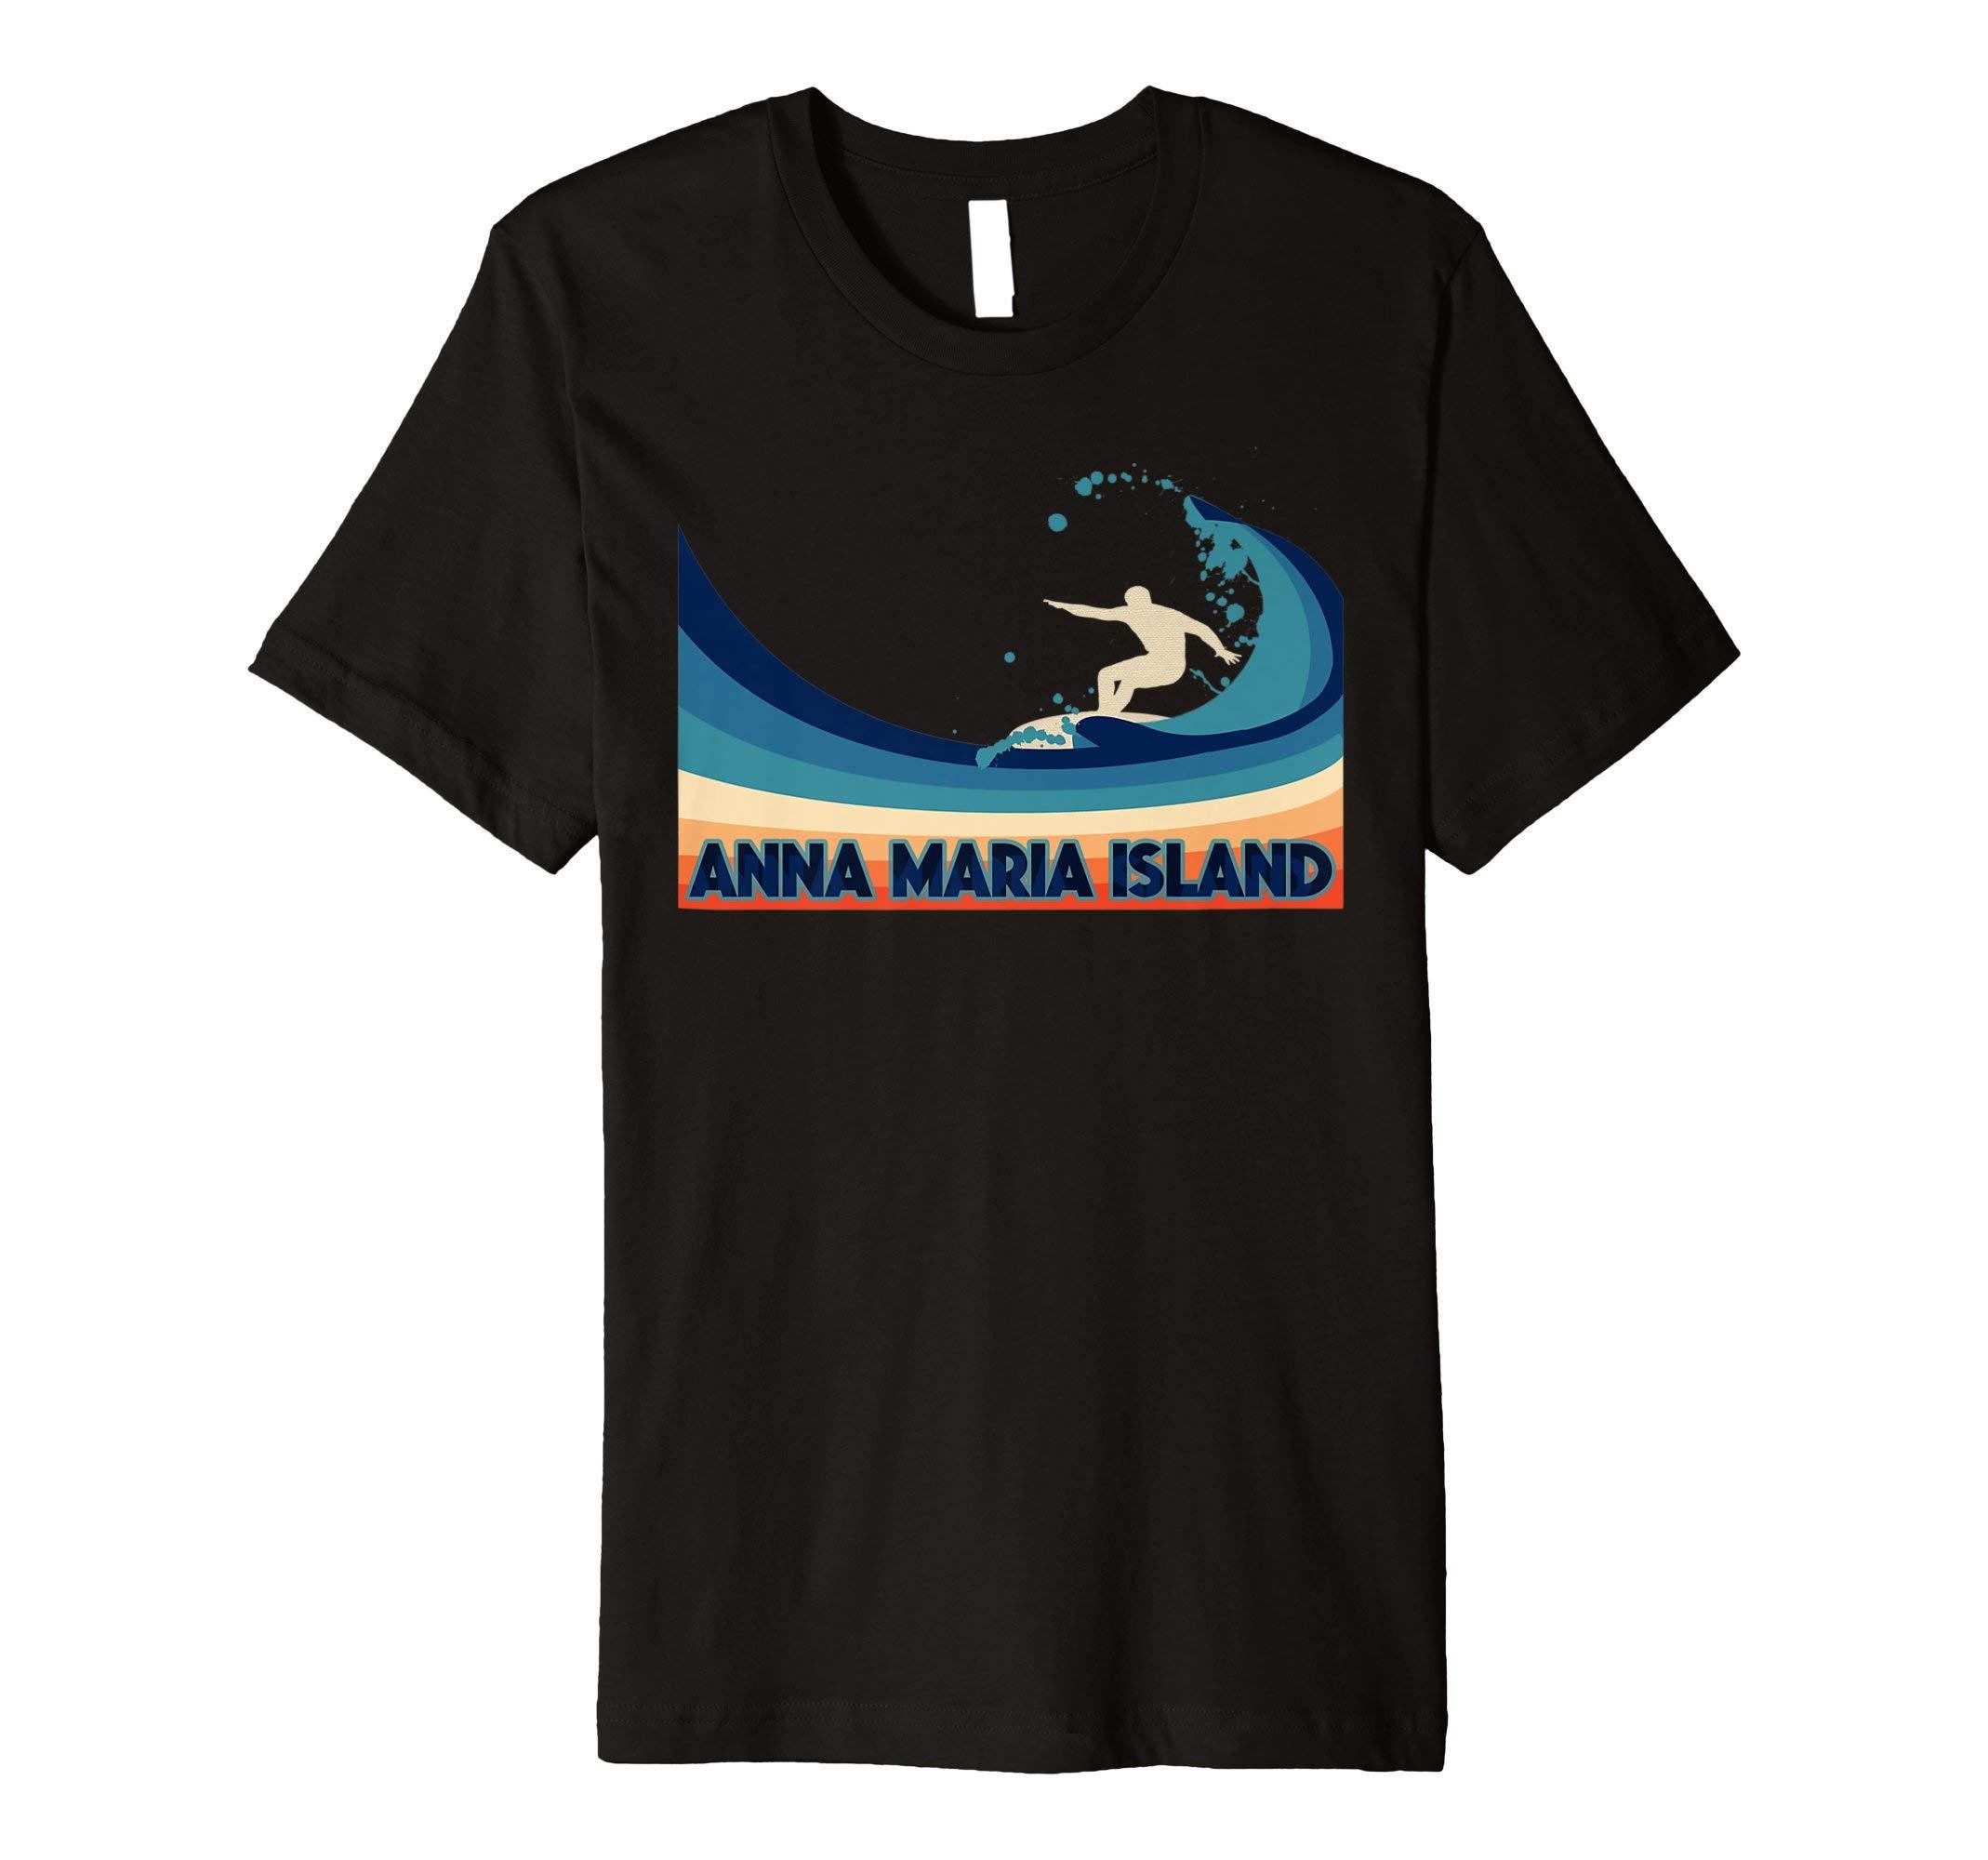 Anna Maria Island Retro 80s Style Tee Shirt Travel Souvenir